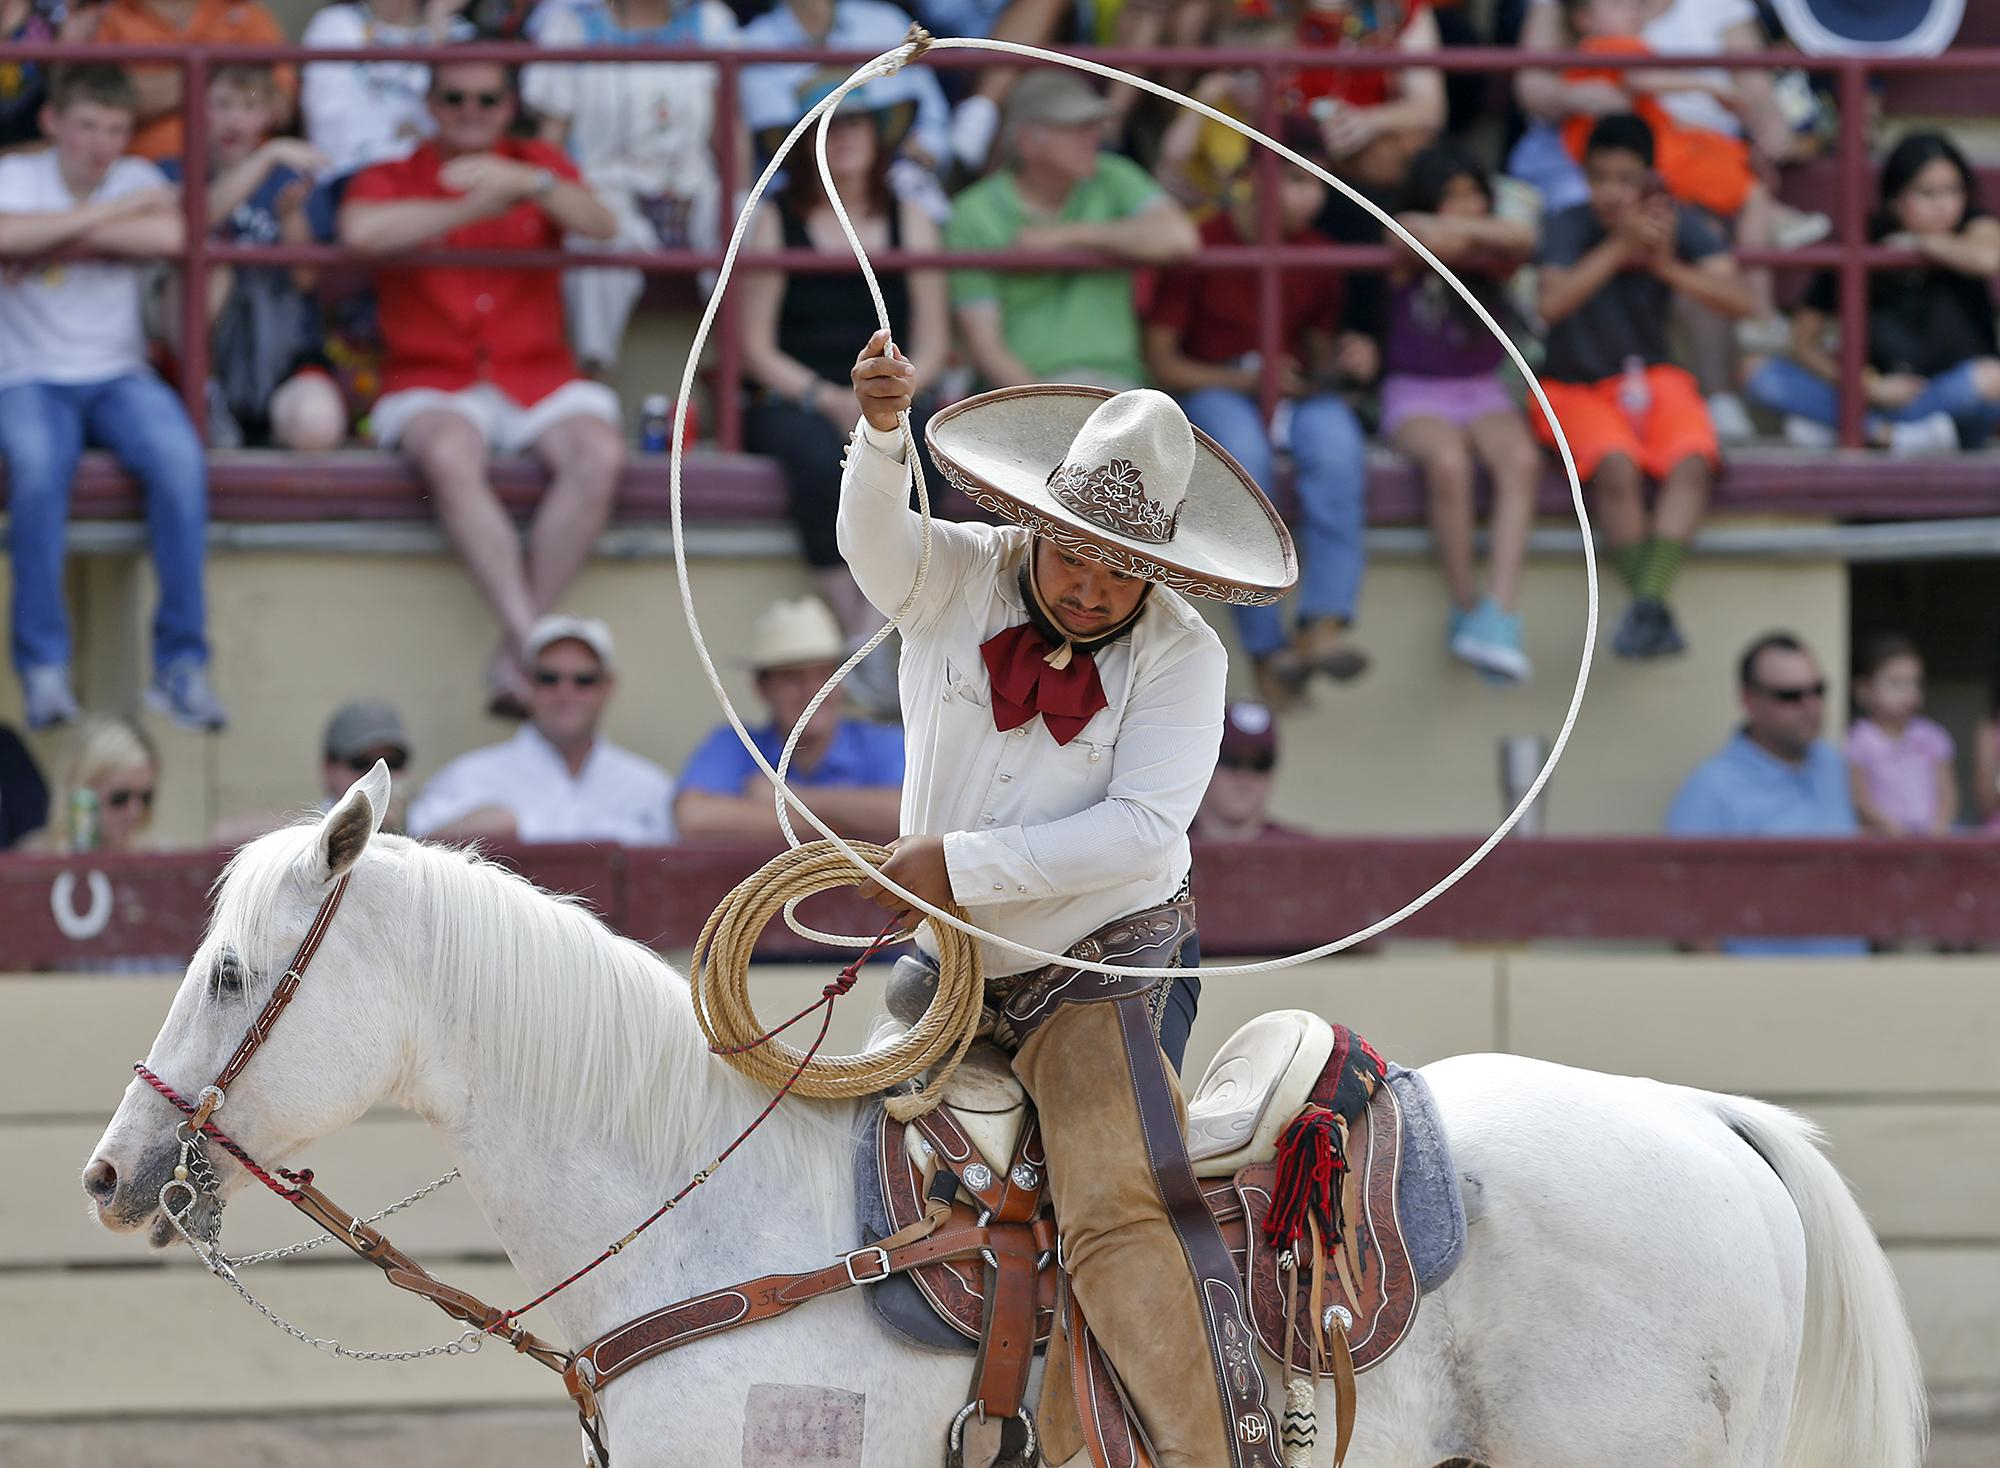 Official Calendar Of Fiesta 2019 Events  San Antonio with regard to Empires And Puzzles Events Calendar